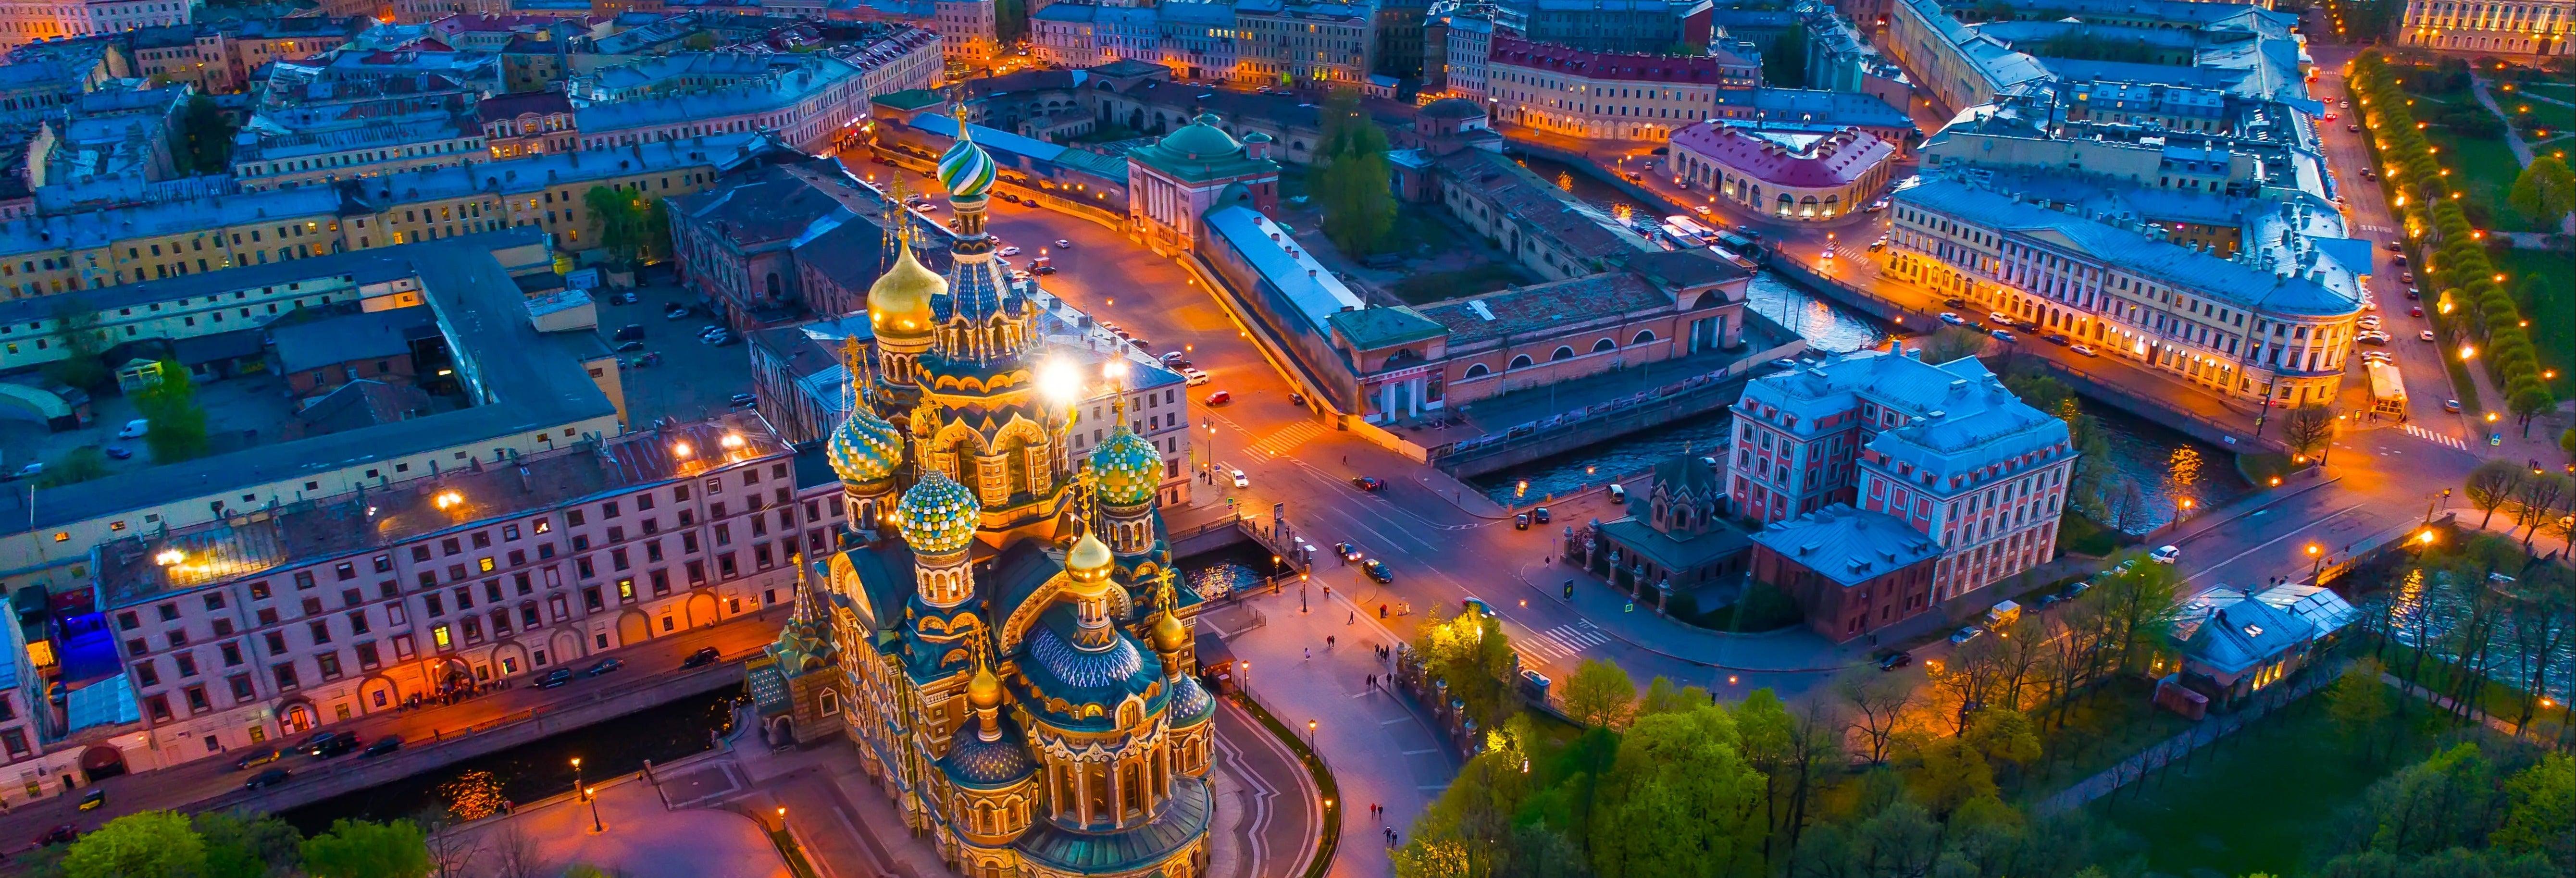 Tour nocturno por San Petersburgo